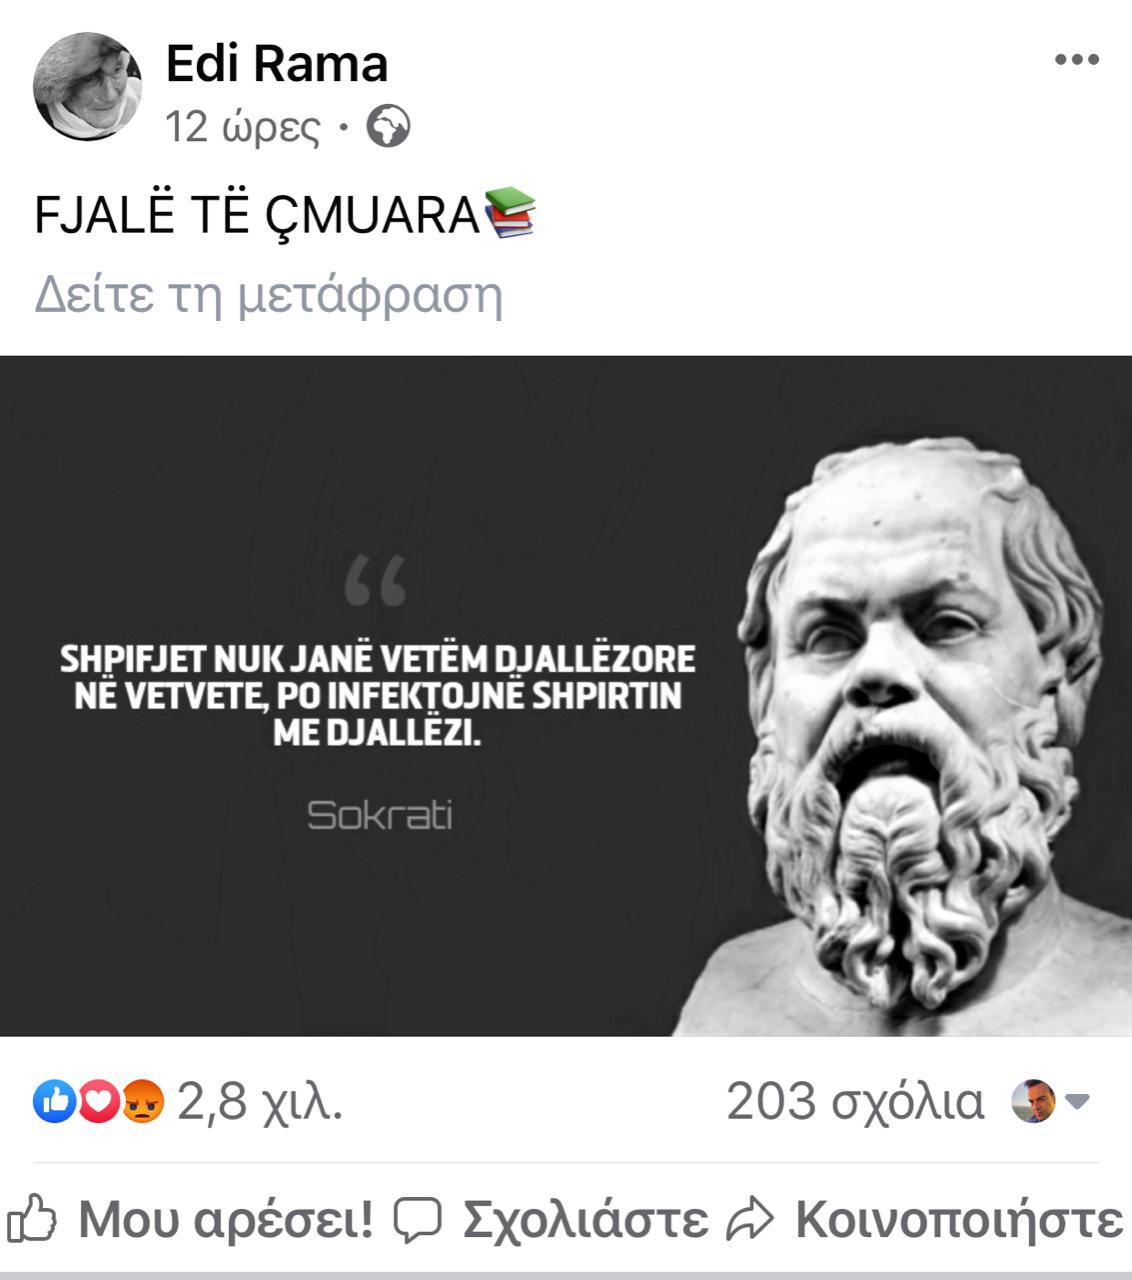 Rama responds to anti-corruption legislation with a Socrates quote